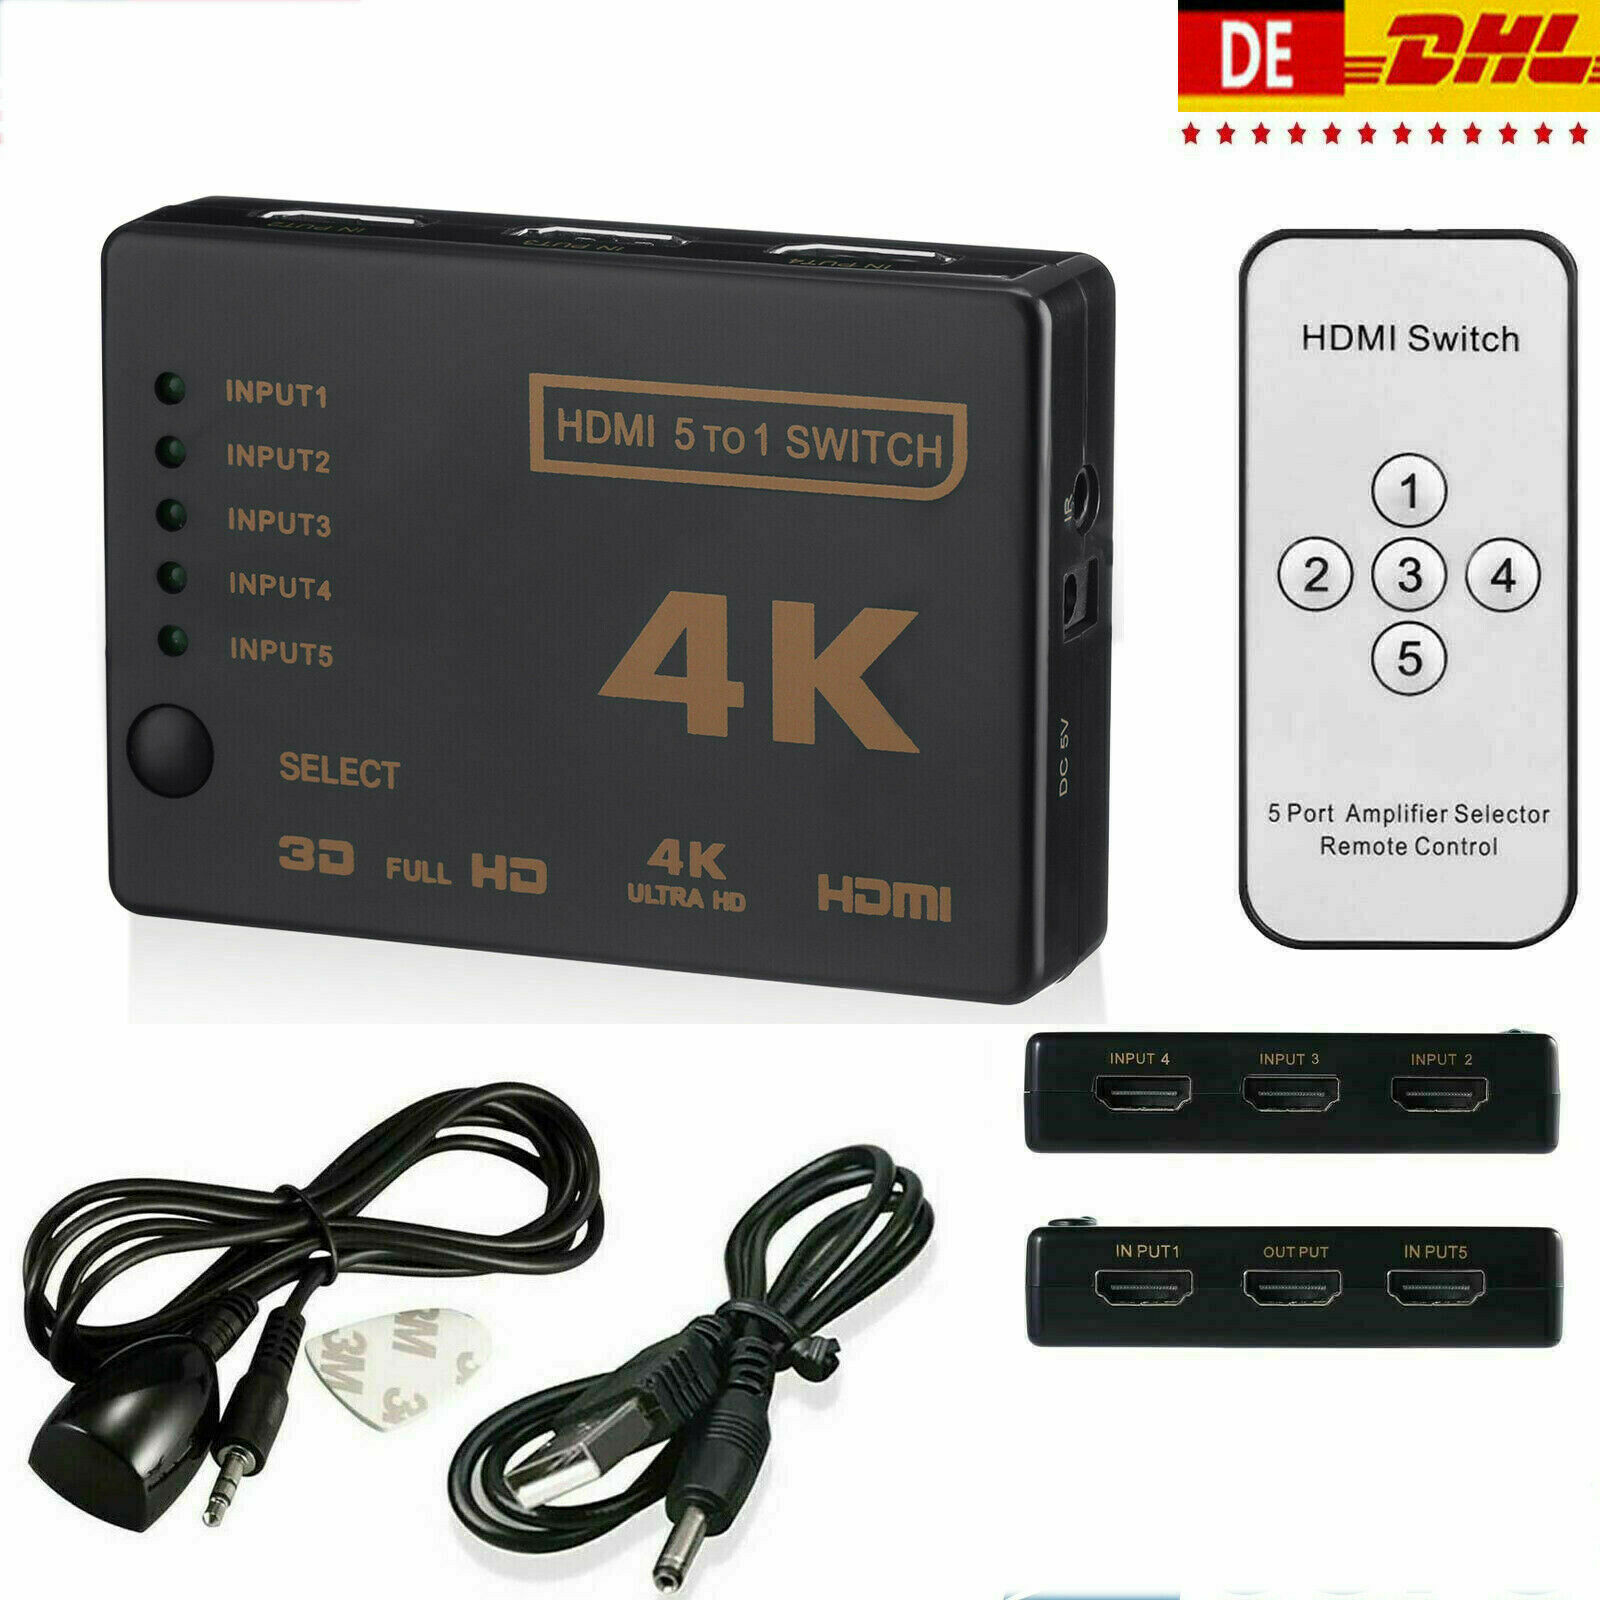 5 in 1 HDMI Splitter Switch Adapter Umschalter Verteiler 4K Ultra HD HDCP 3D HDR